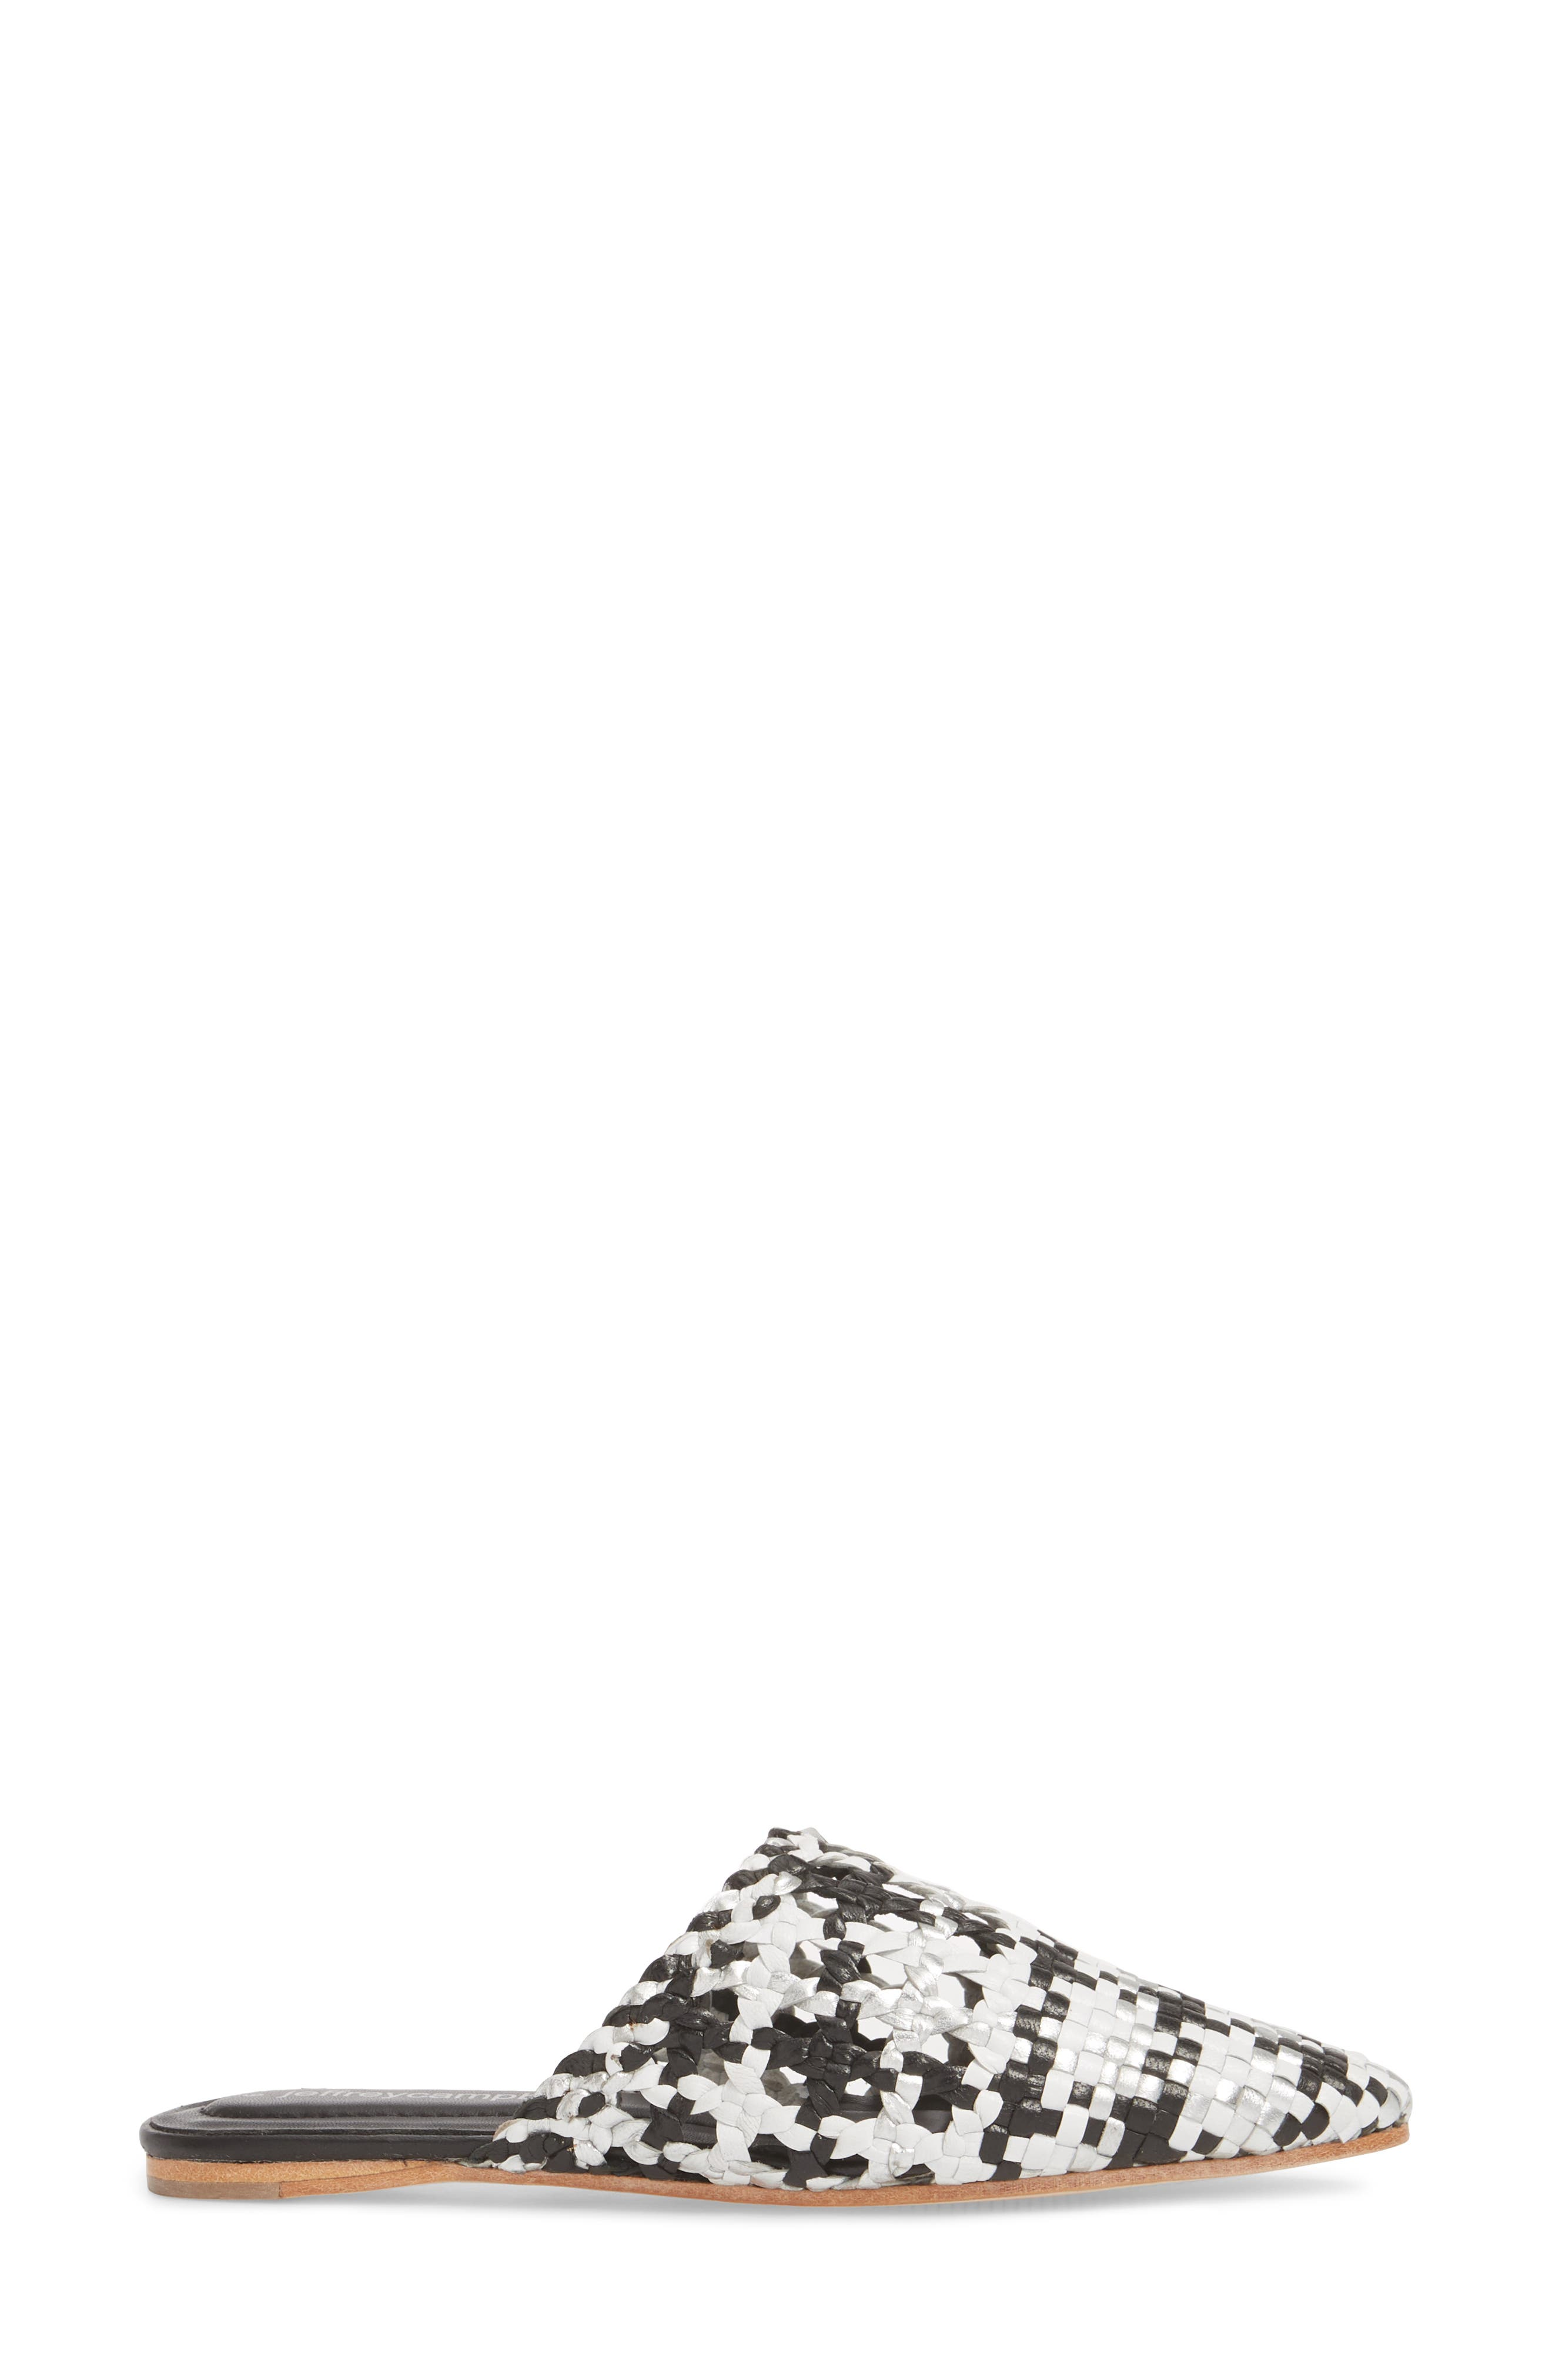 Atrata-WV Woven Mule,                             Alternate thumbnail 3, color,                             Black White Silver